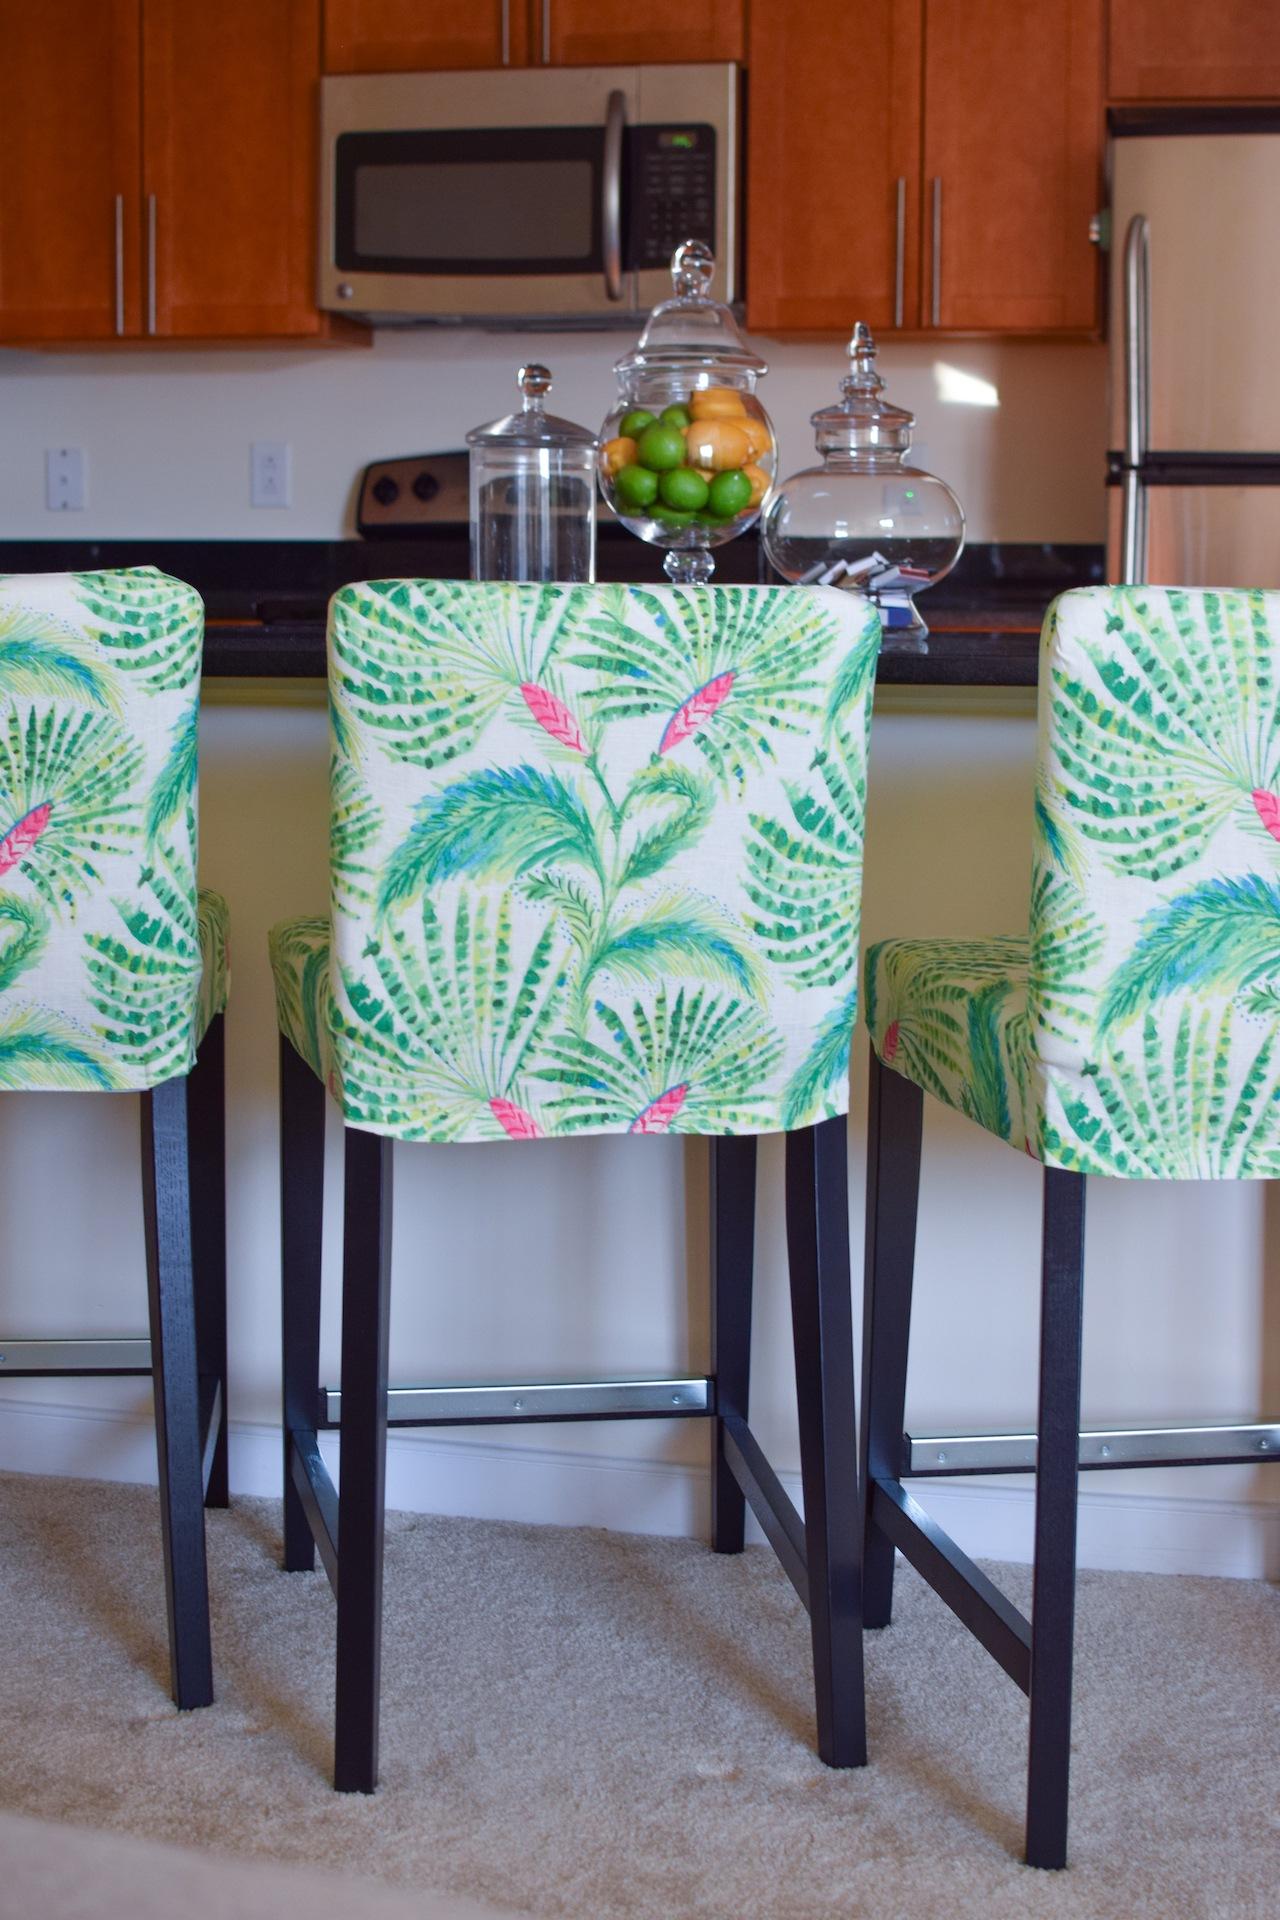 Swell Ikea Henriksdal Bar Stool Slipcover Rockin Cushions A Machost Co Dining Chair Design Ideas Machostcouk